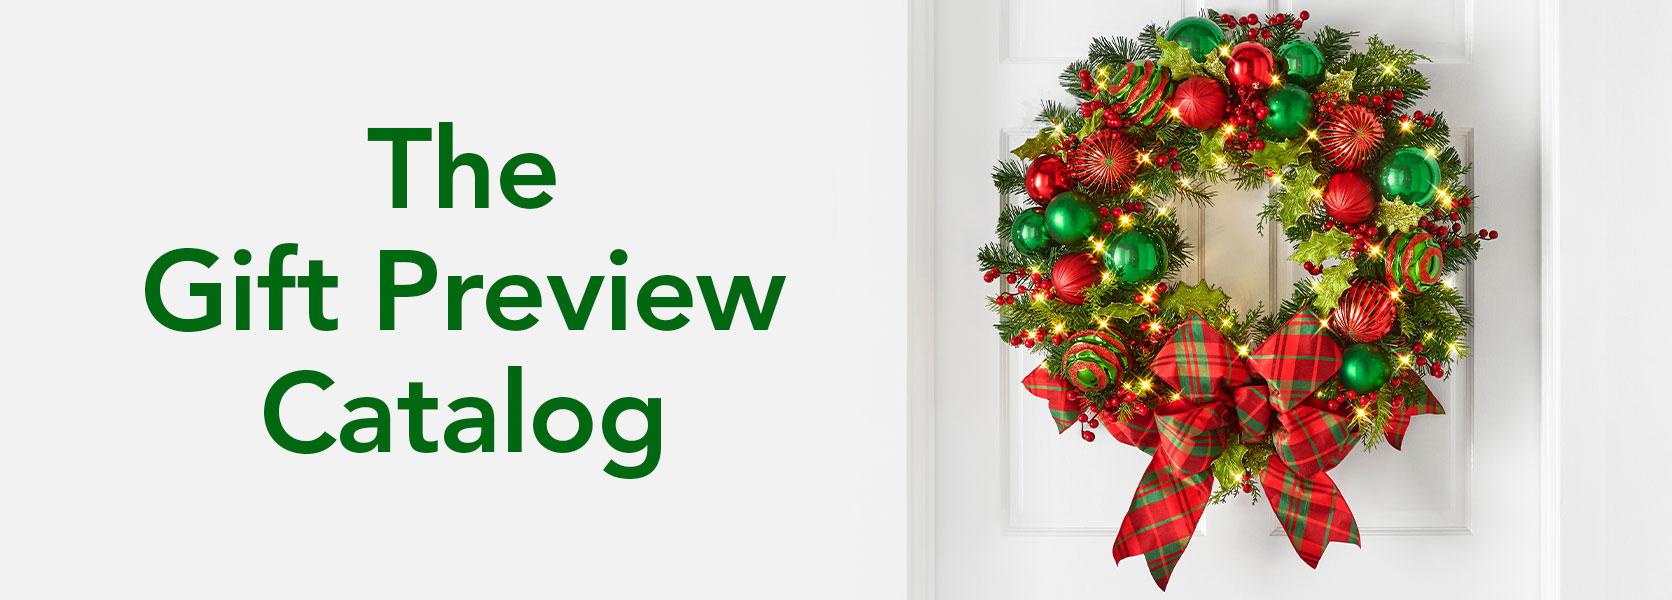 The Christmas Plaid Holiday Wreath